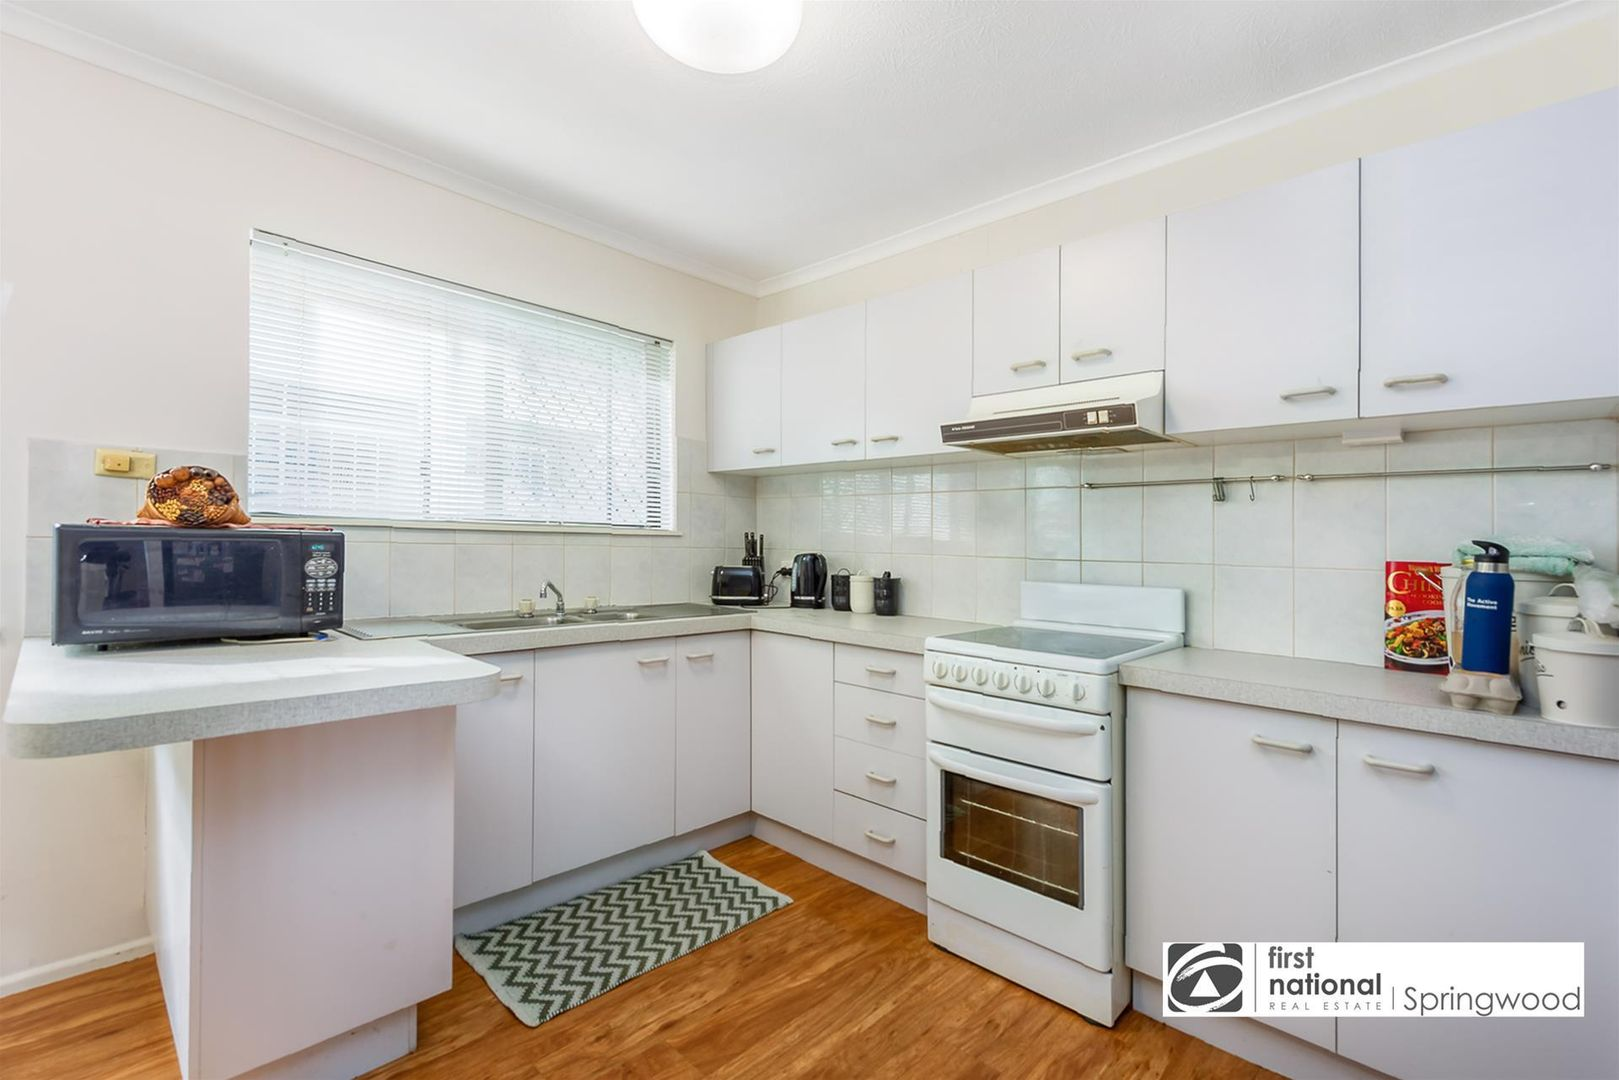 28/155 John Paul Drive, Springwood QLD 4127, Image 2